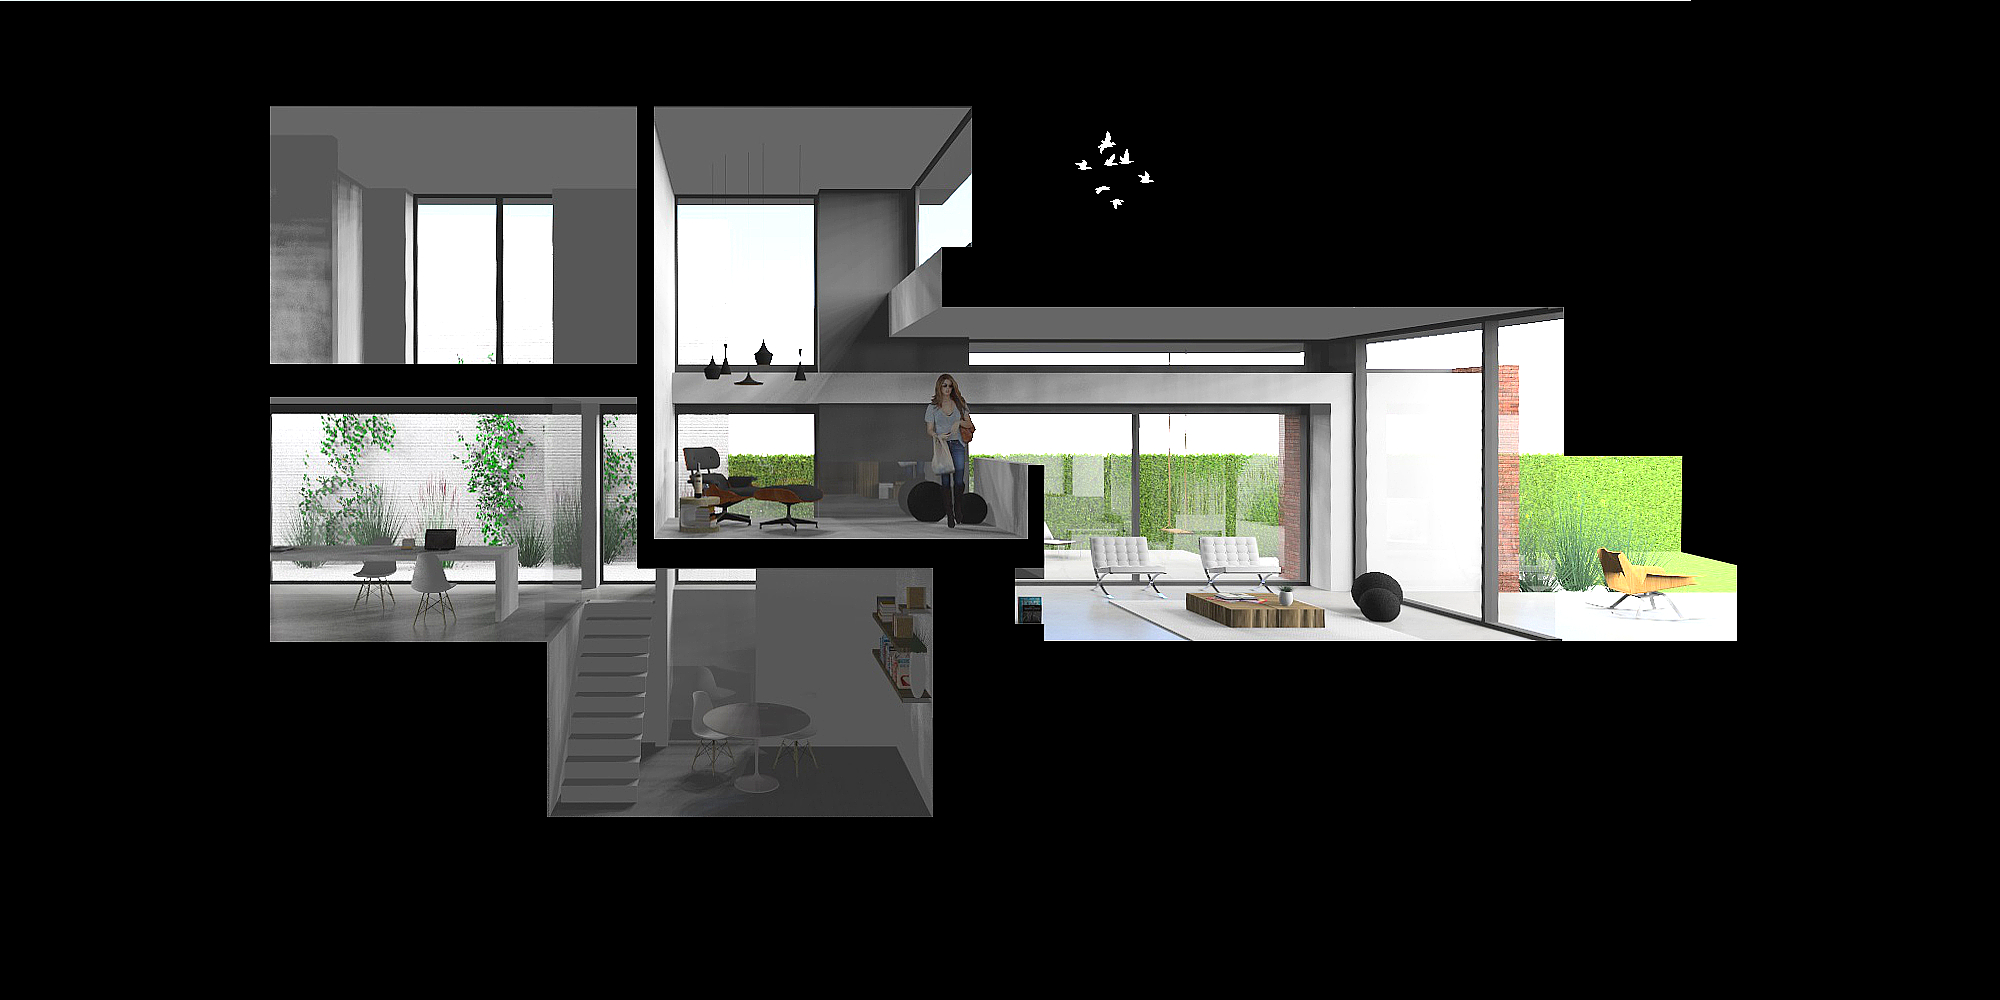 14_009_VC_ontwerp 3D.jpg